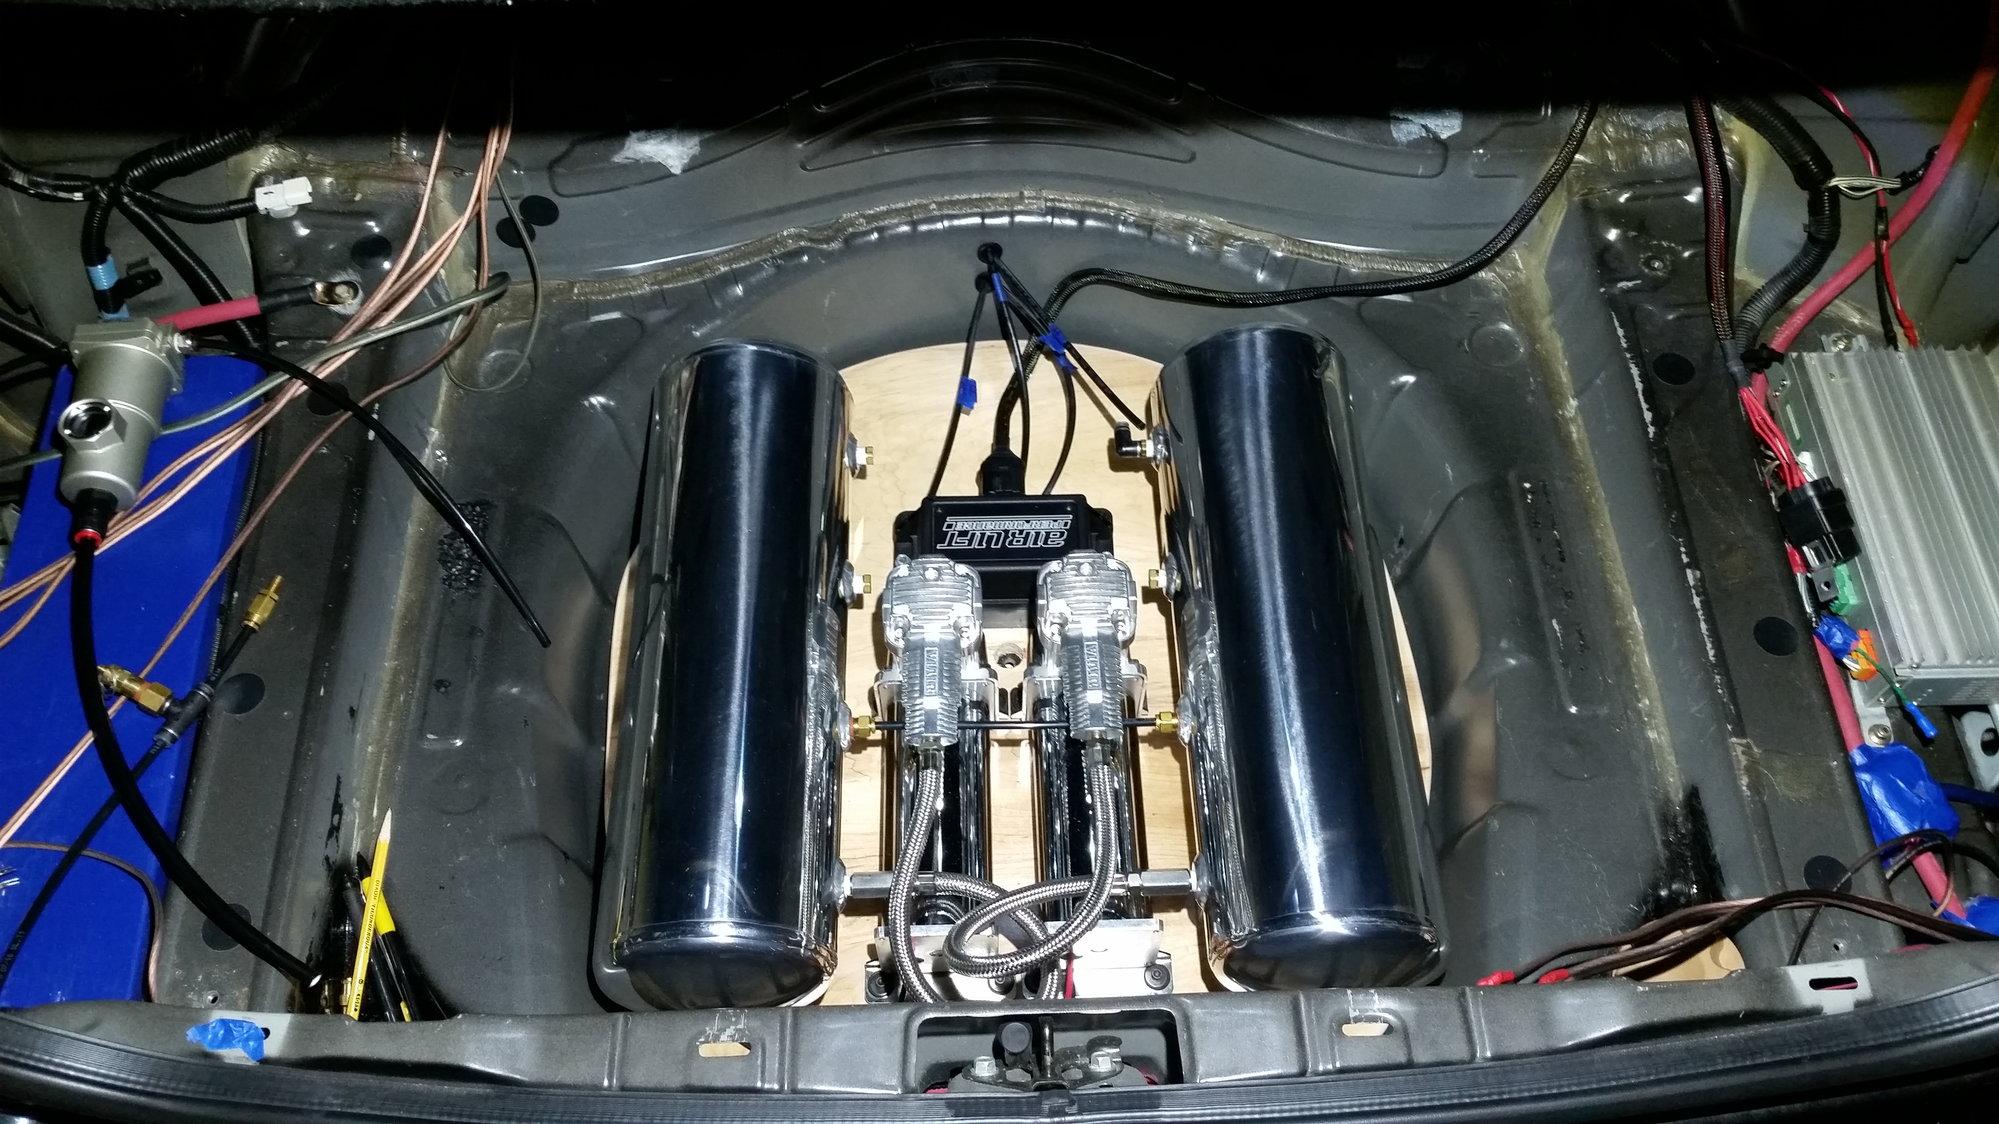 Black GS400 DIY VIP build - Page 3 - ClubLexus - Lexus Forum